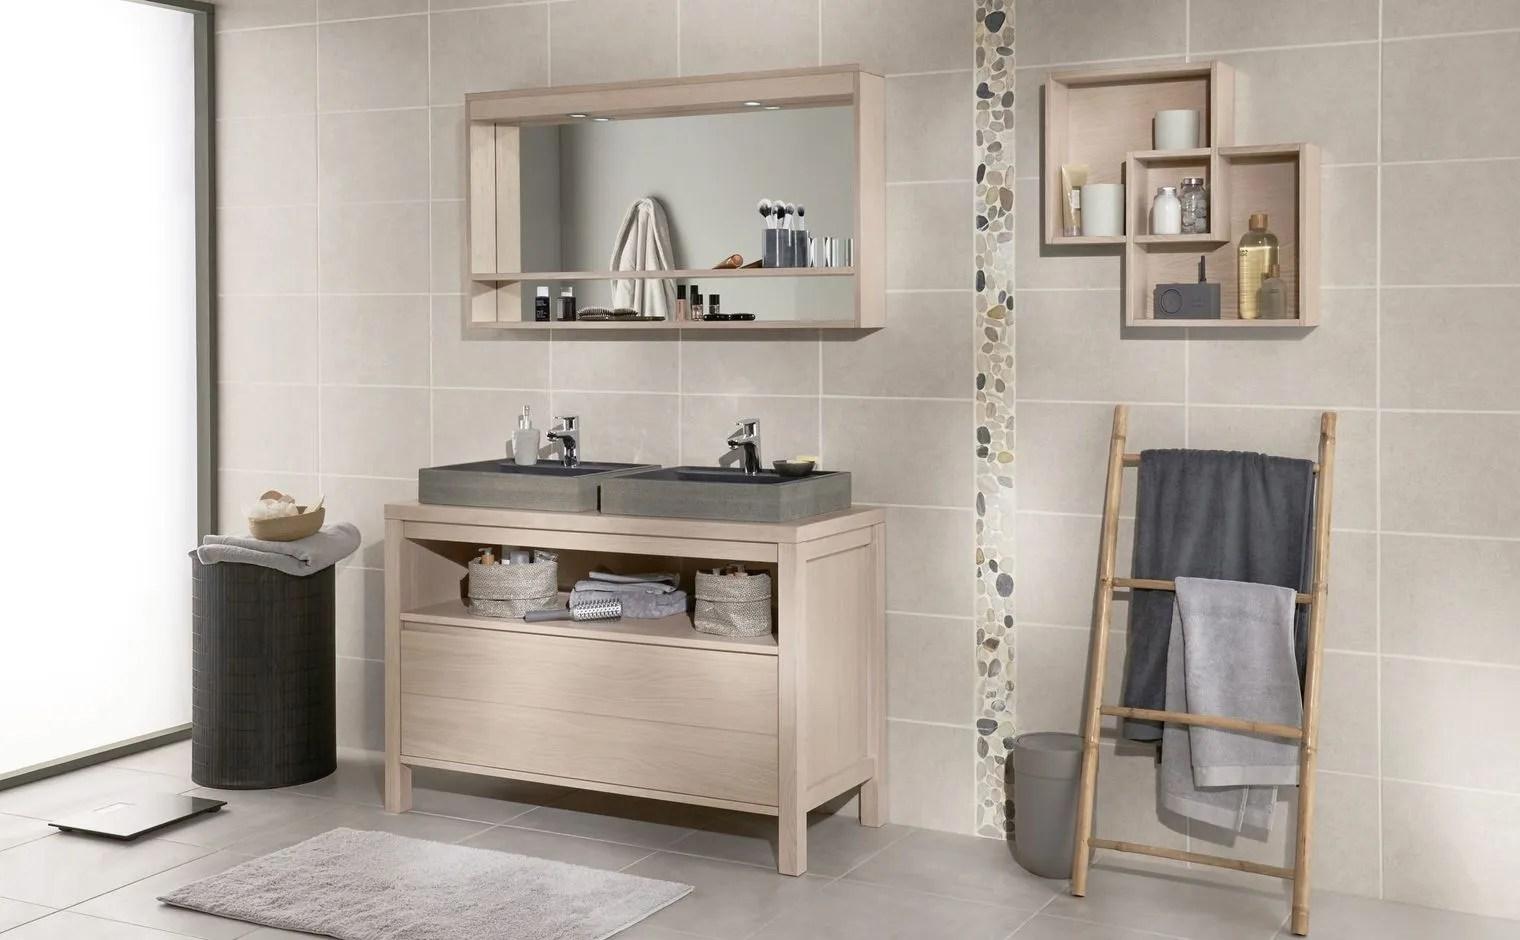 Salle de bain type industriel meuble salle de bain type - Salle de bain chocolat et blanc ...